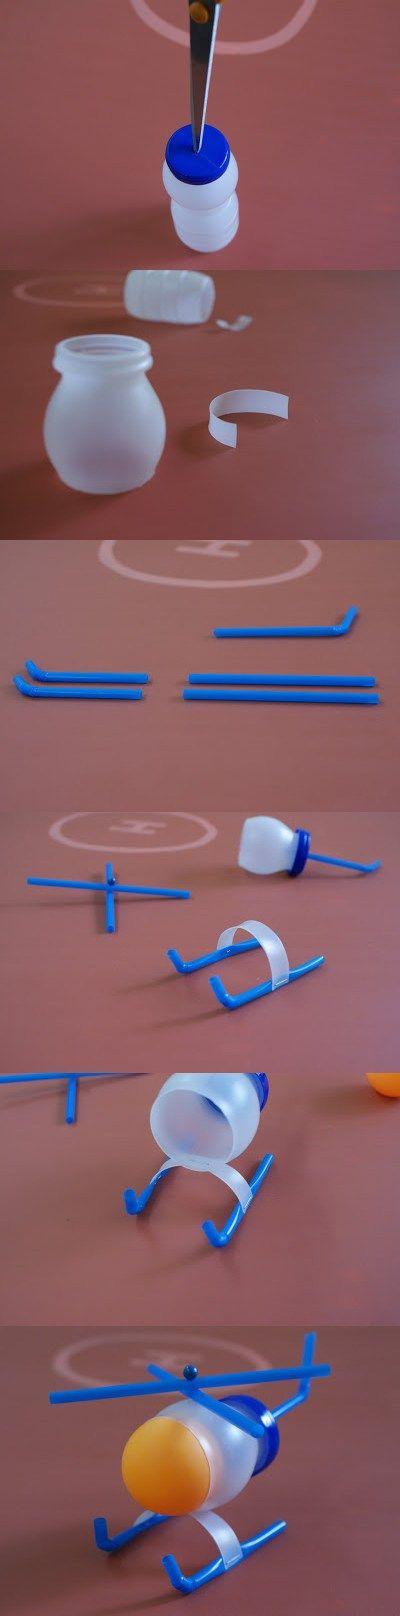 juguete-helicoptero-reciclando-muy-ingenioso-2